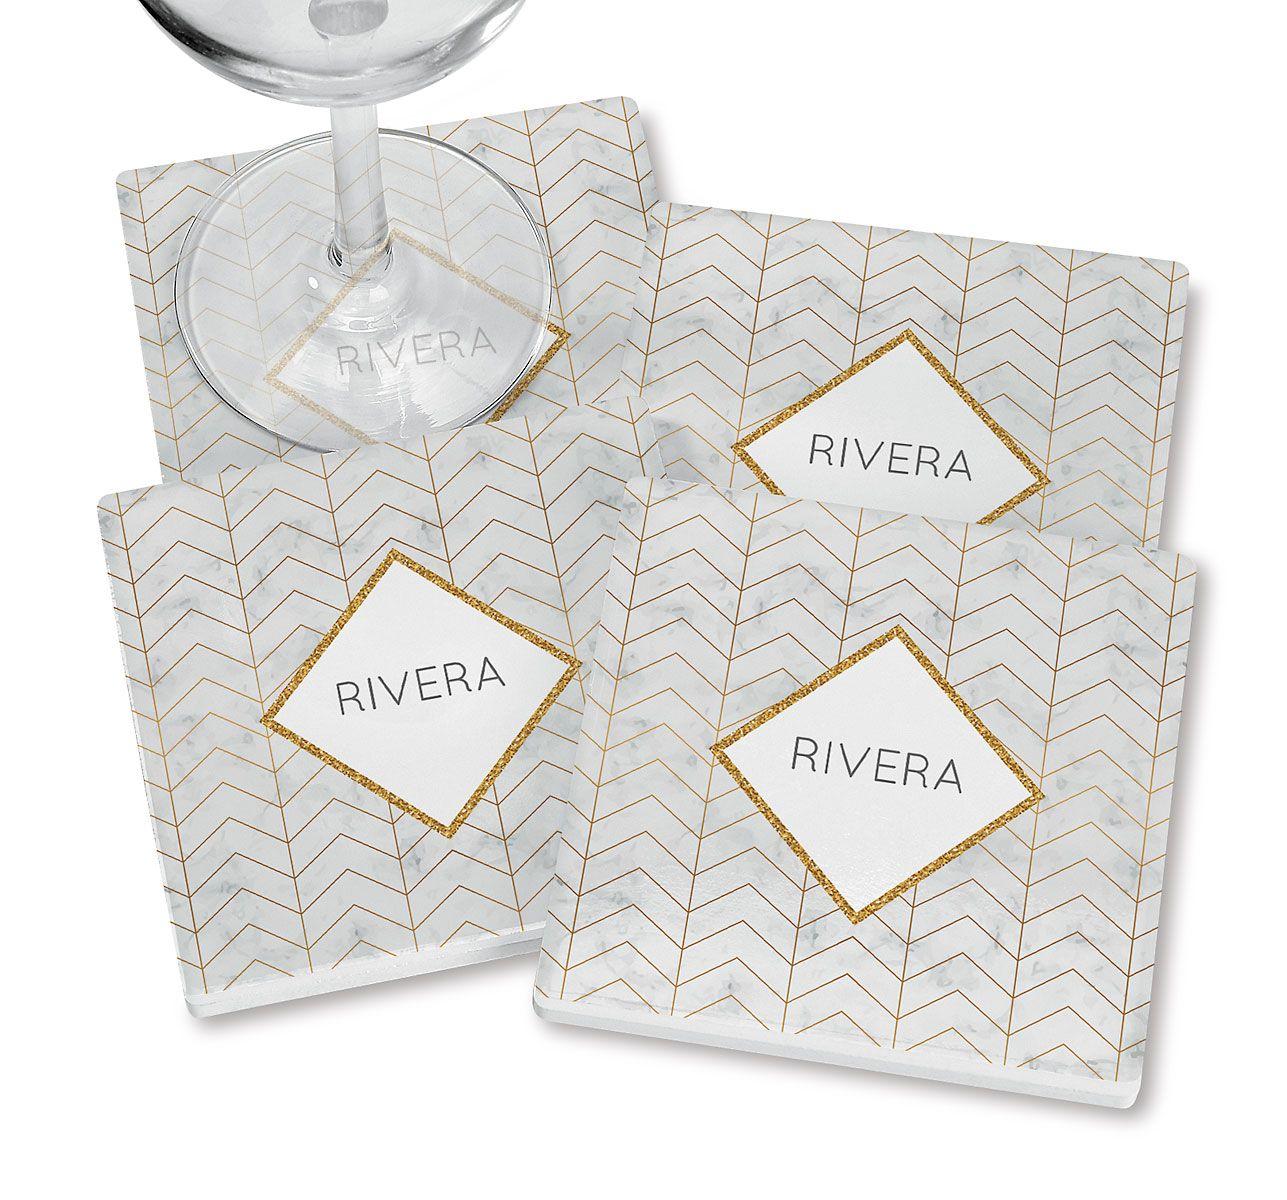 Personalized Sunday Chevron Coasters